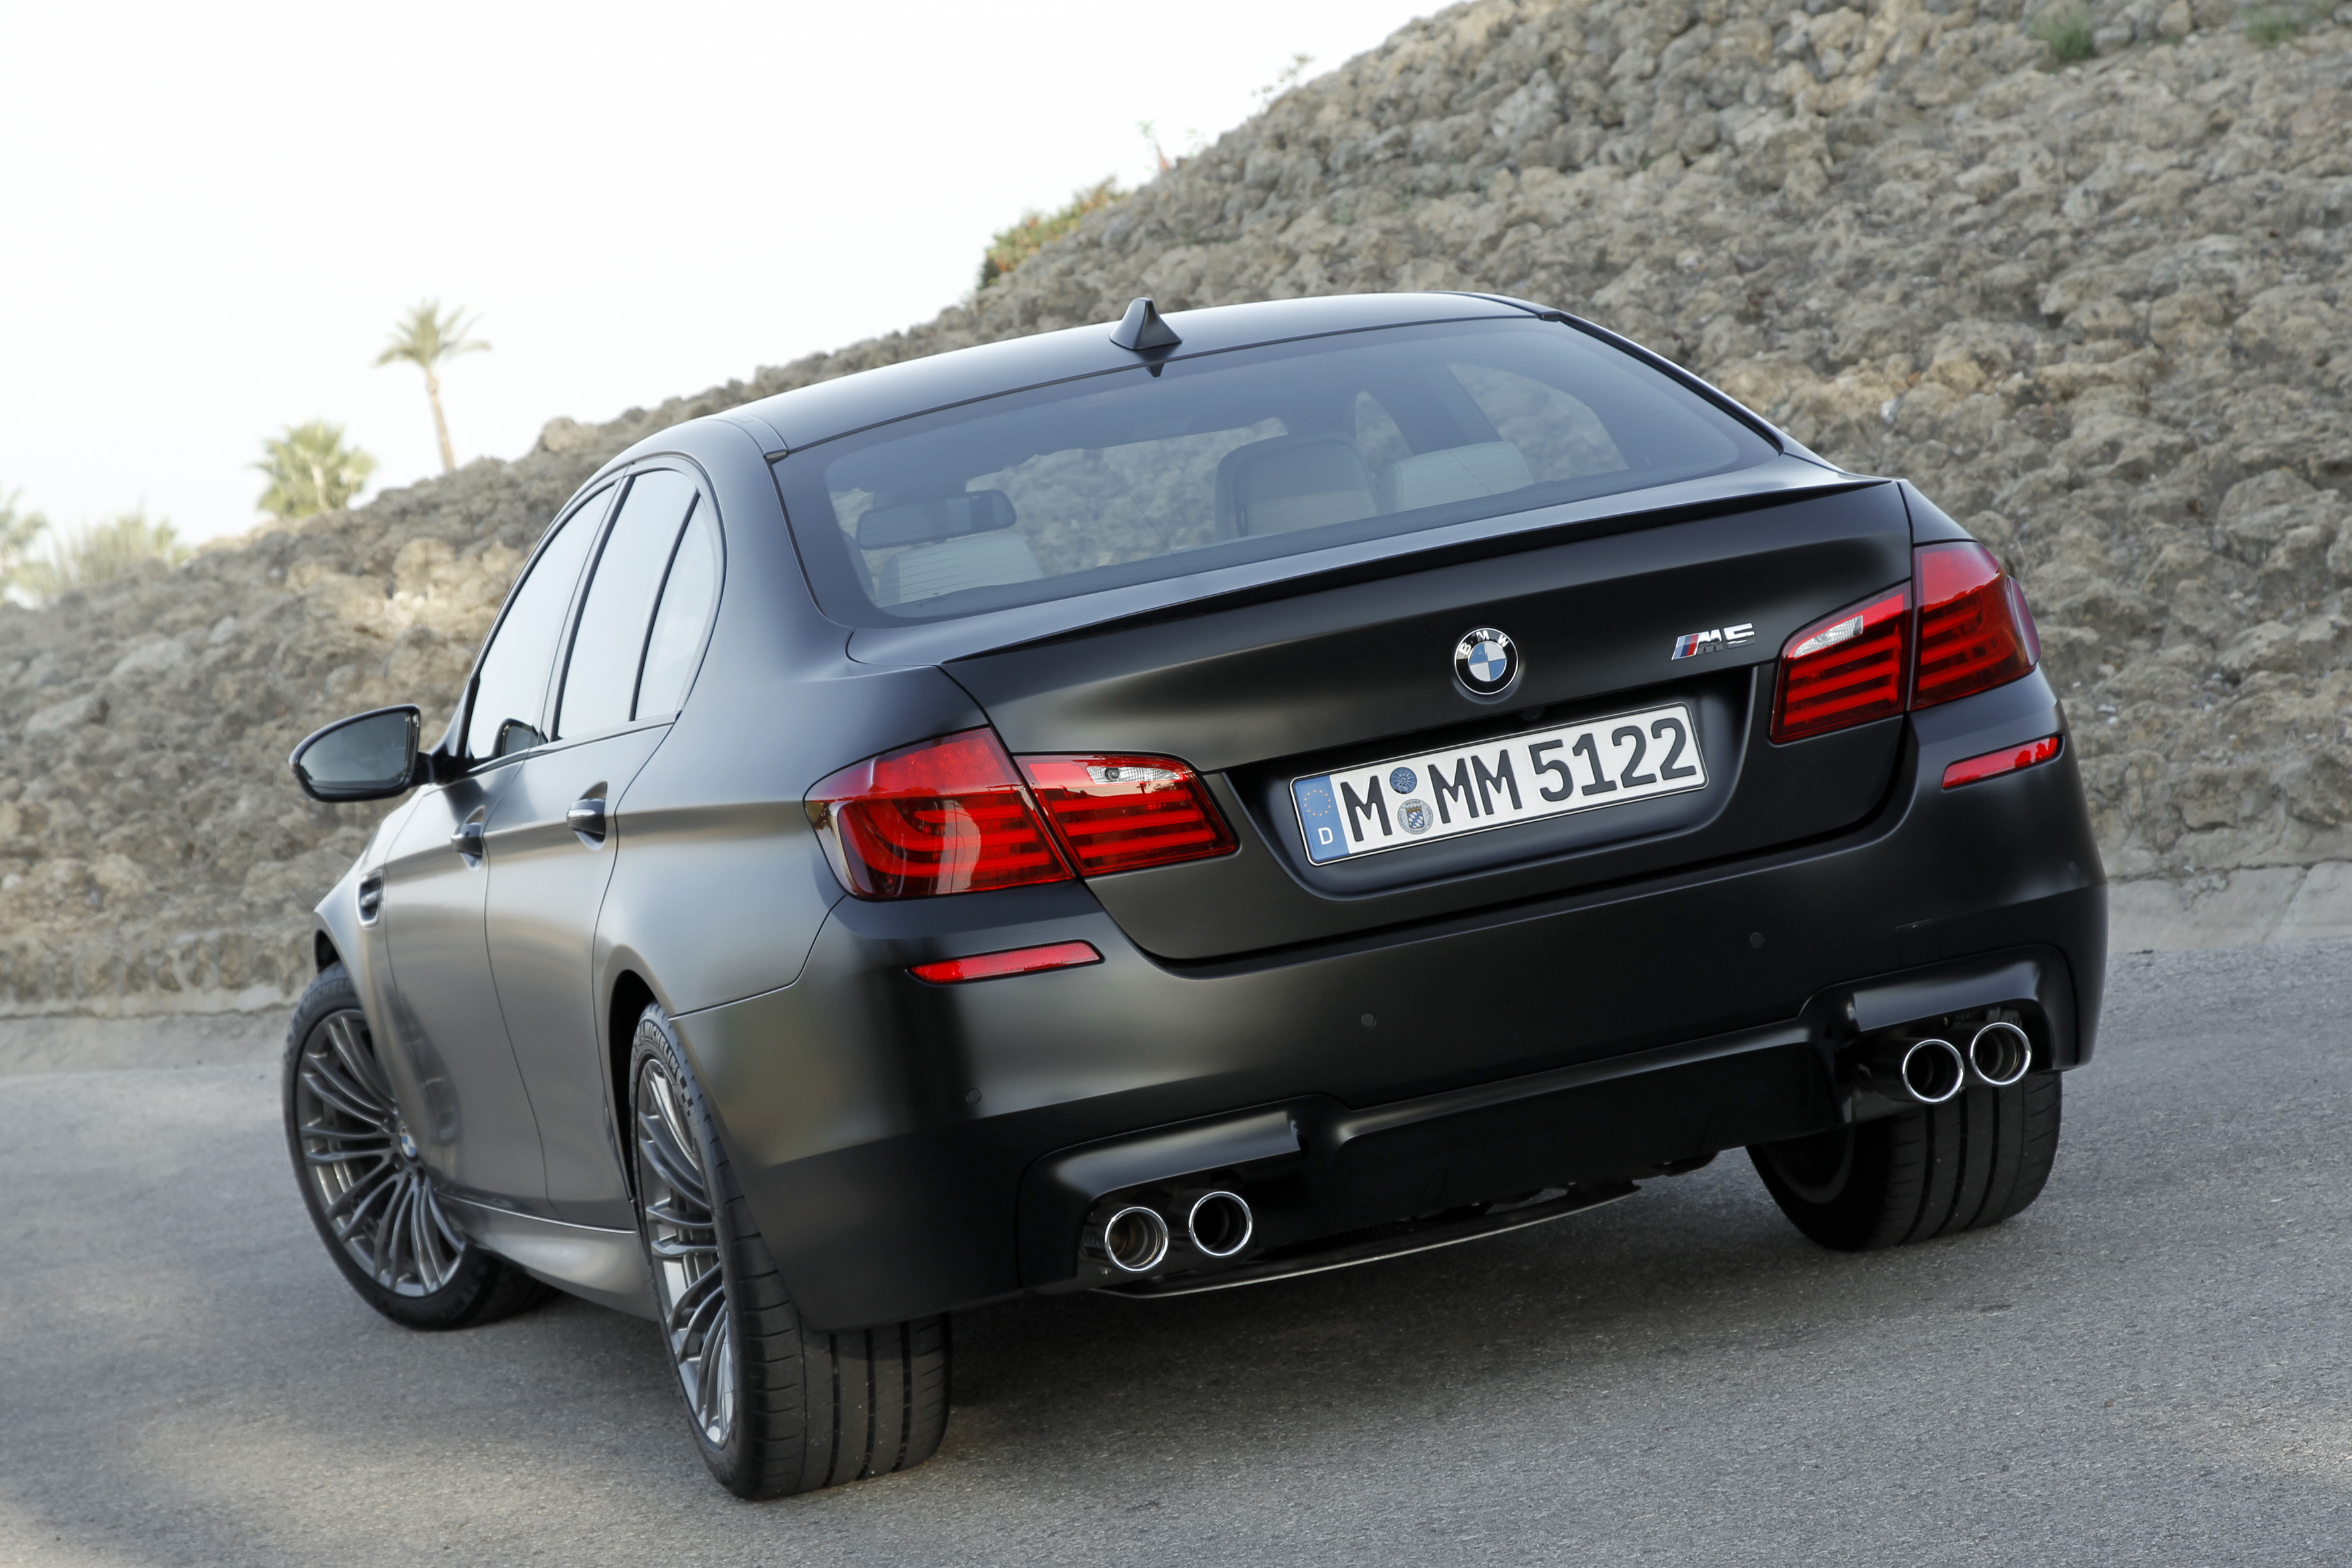 F10 BMW M5 showcased in Frozen Black matte paintjob Image 72043